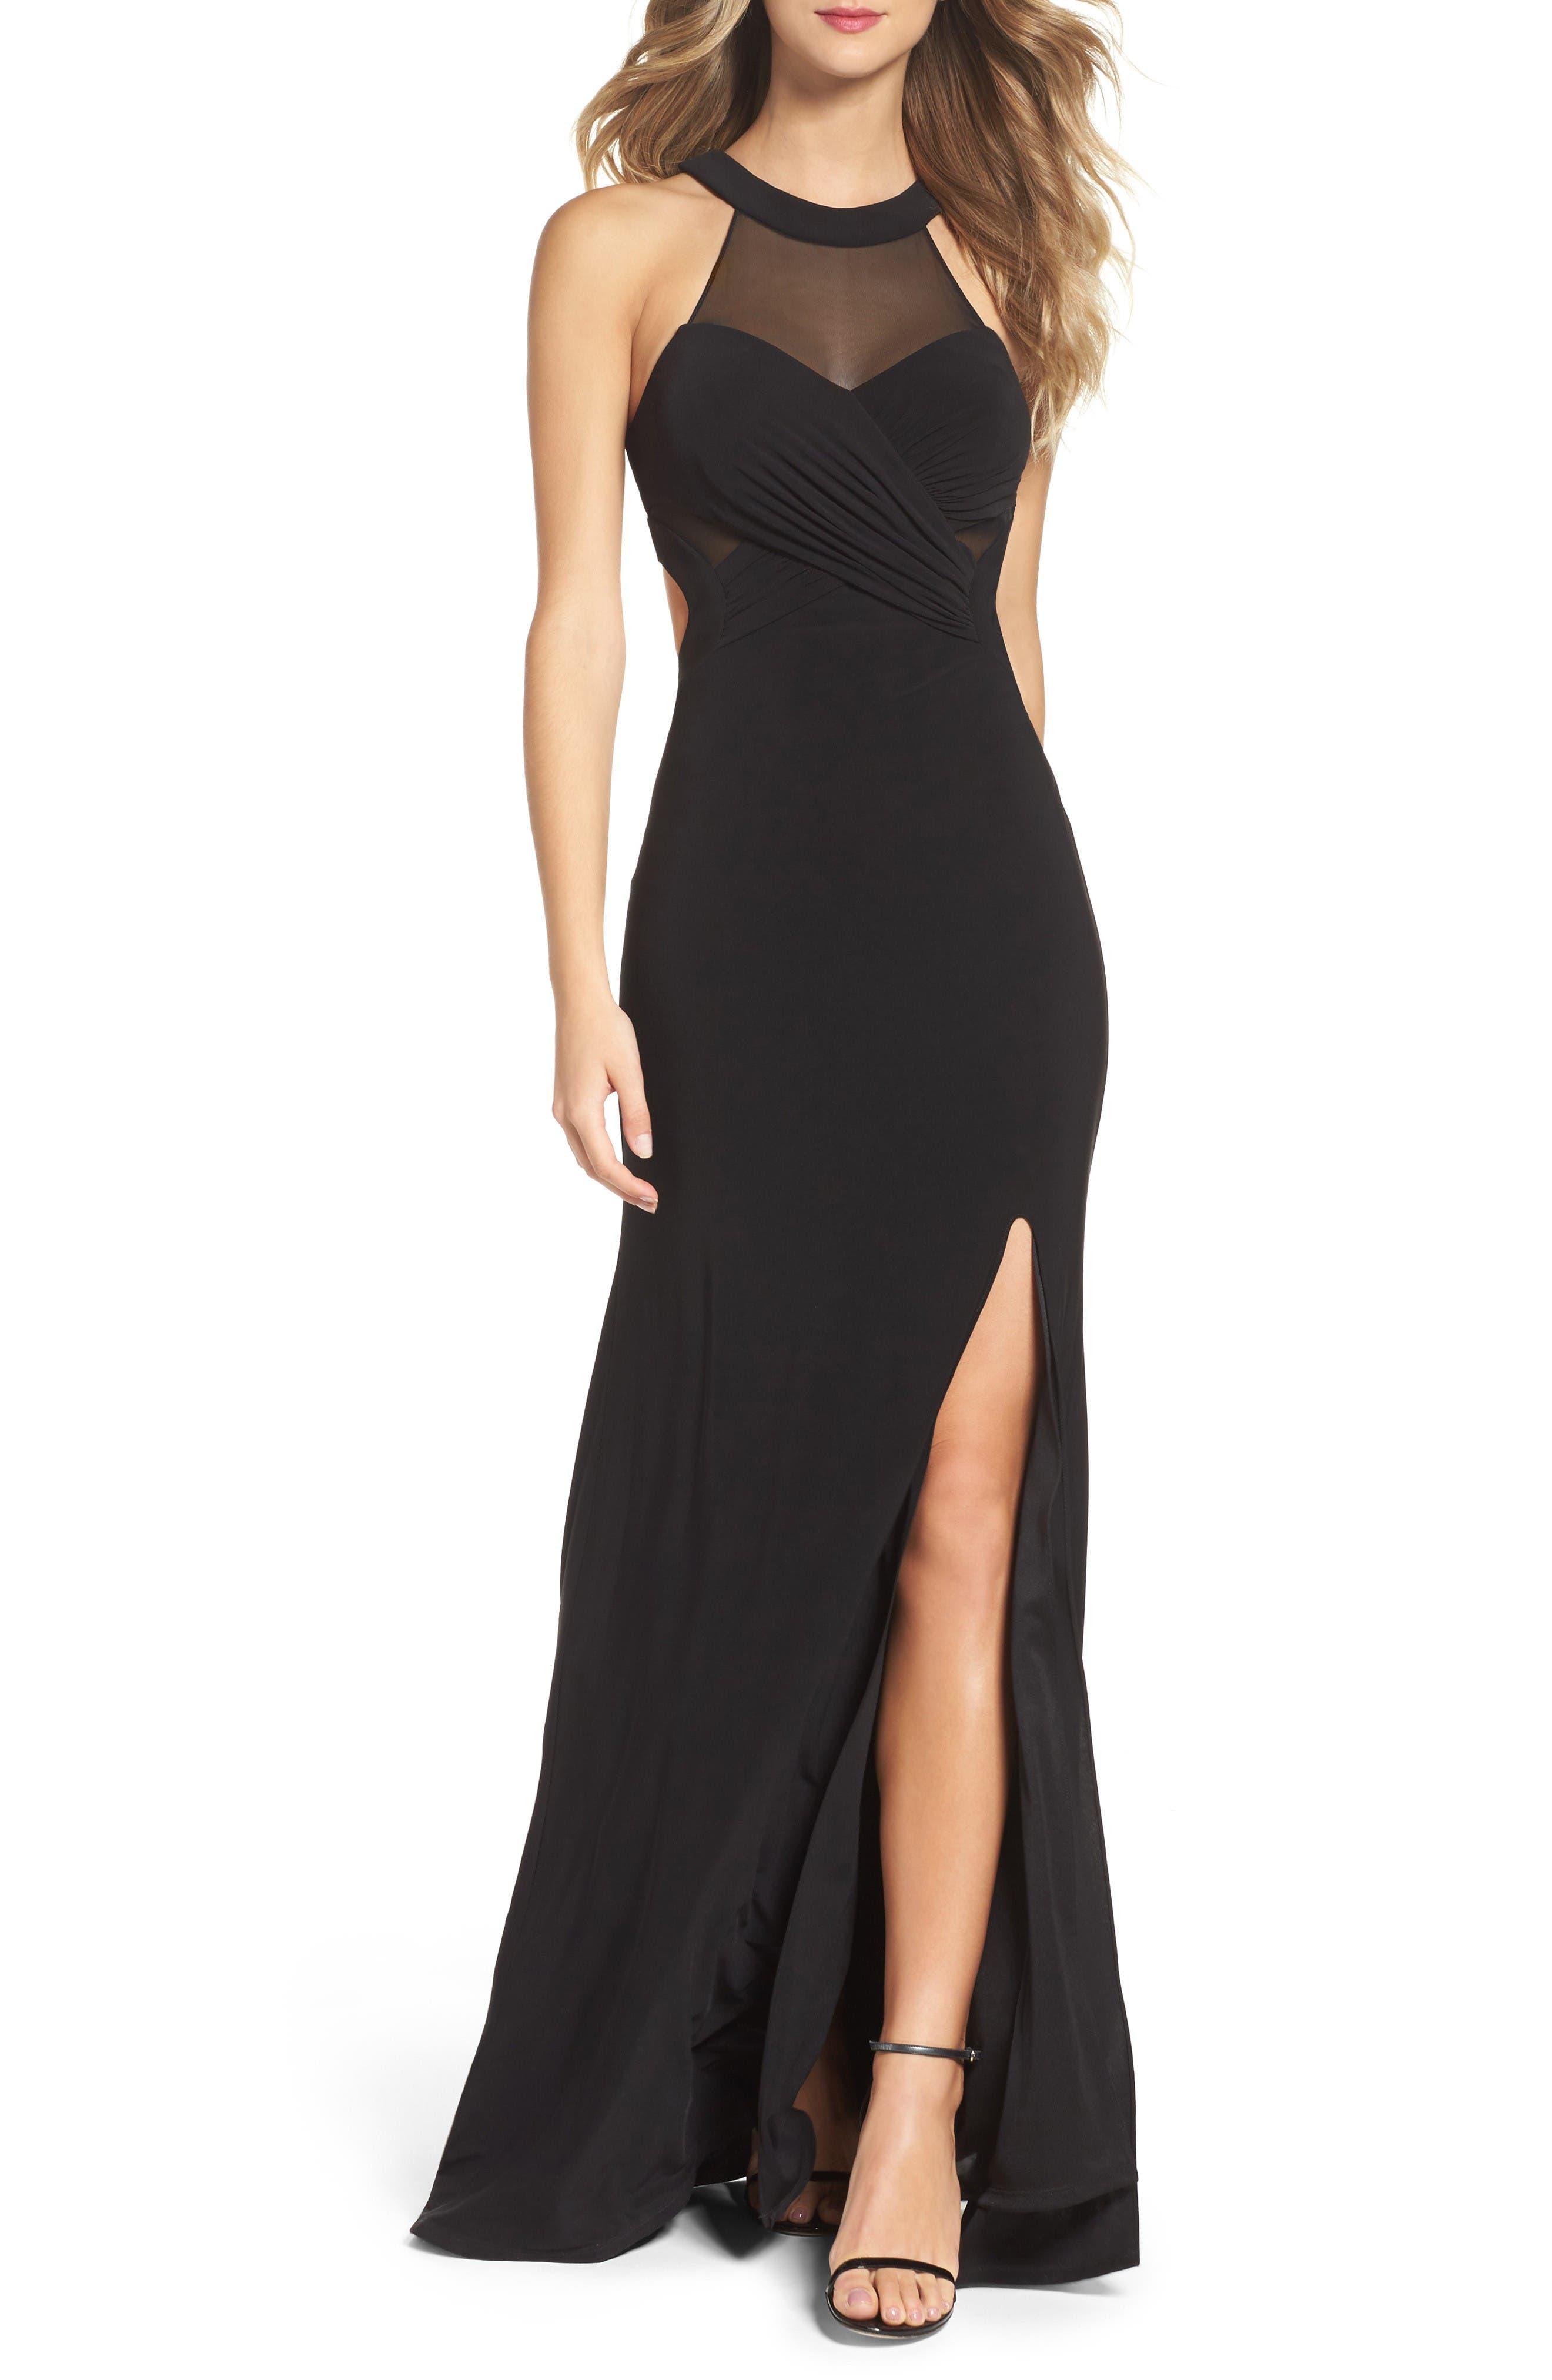 Alternate Image 1 Selected - Xscape Mesh & Jersey Gown (Regular & Petite)